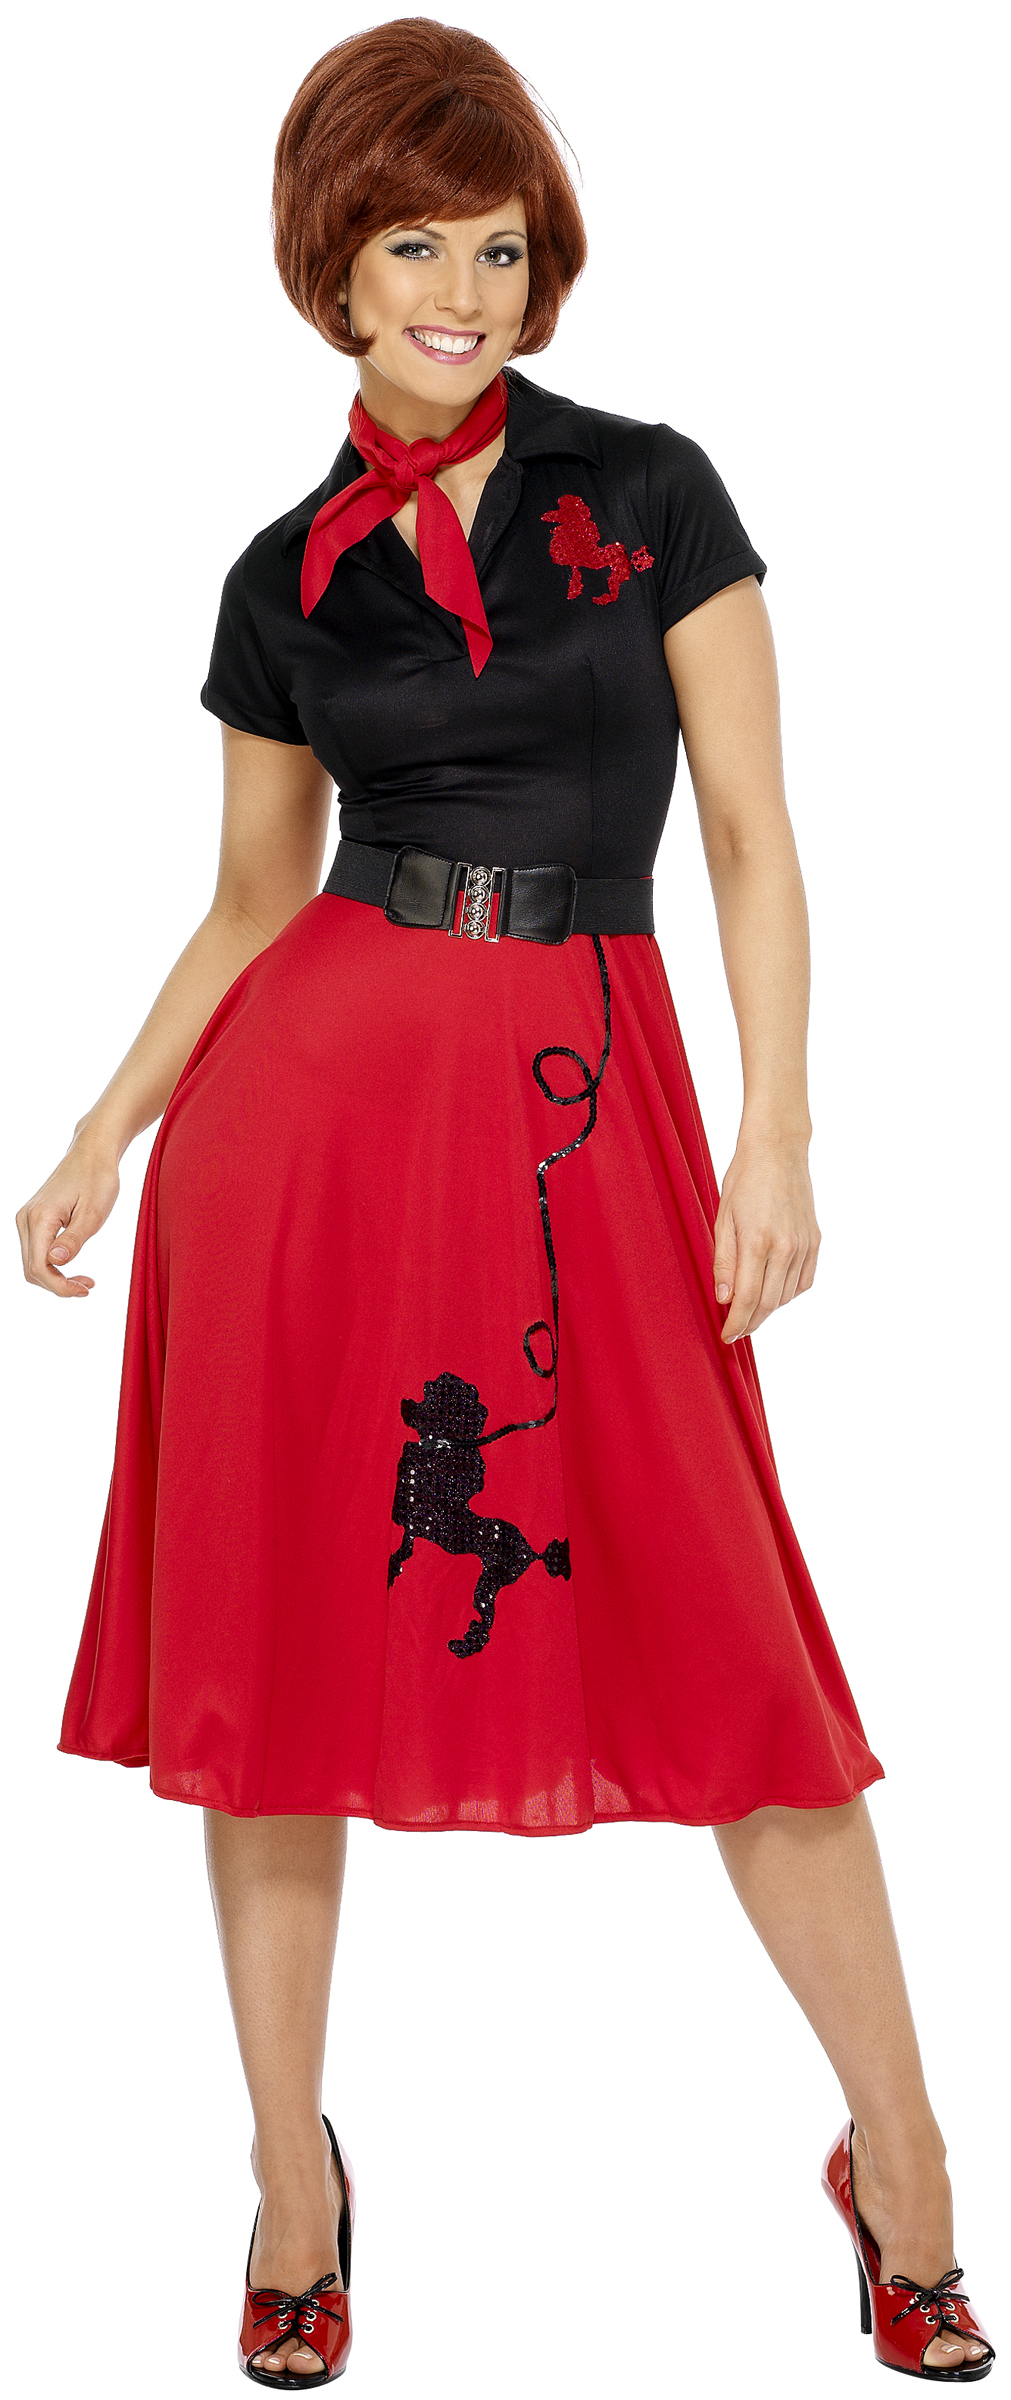 c776167ab79d 50er Jahre Kleid Rock n Roll Kostüm rot-schwarz , günstige Faschings  Kostüme bei Karneval Megastore